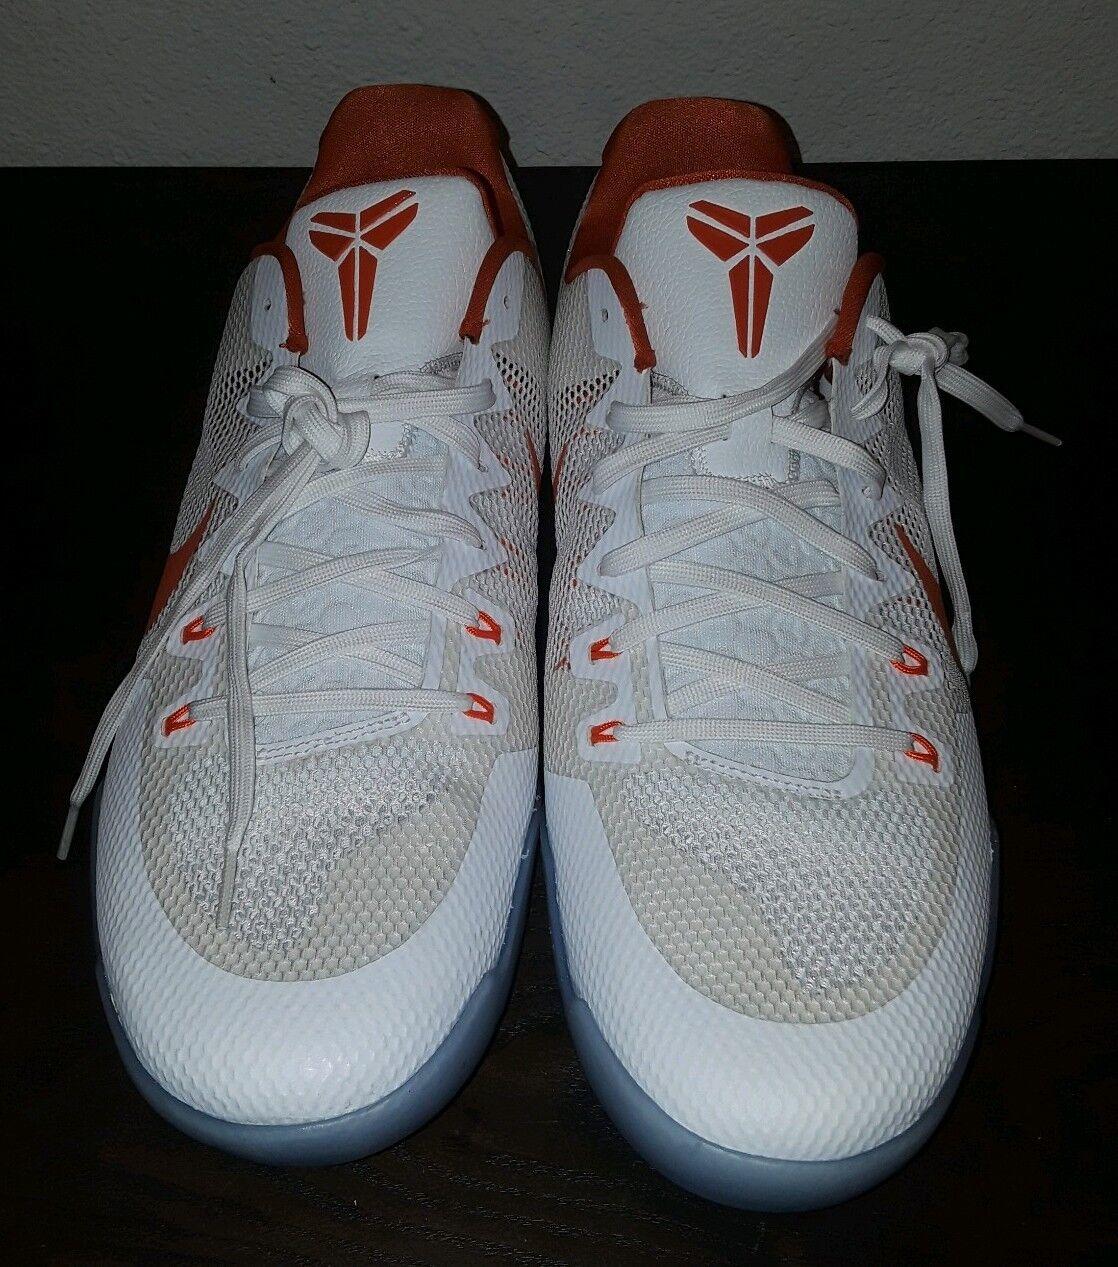 Mens Mens Mens Basketball shoes Size 17.5 Nike Kobe XI 11 TB Promo White orange 856485-180 40c676